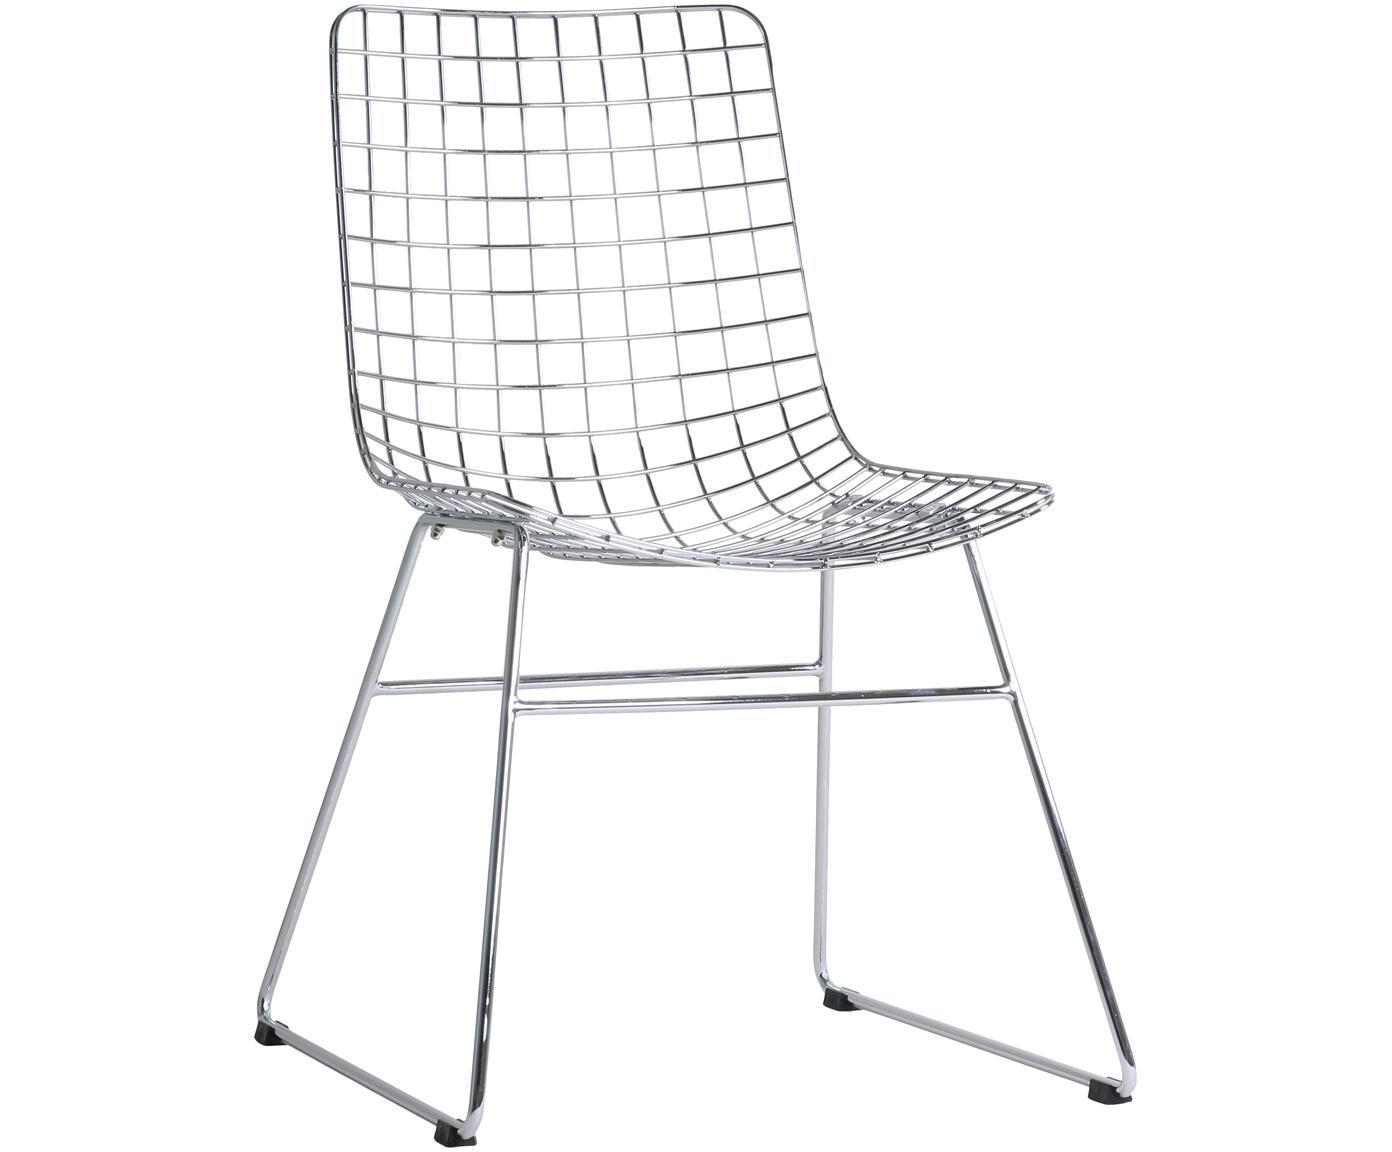 Sedia in metallo Wire, Metallo cromato, Cromo, Larg. 47 x Prof. 54 cm